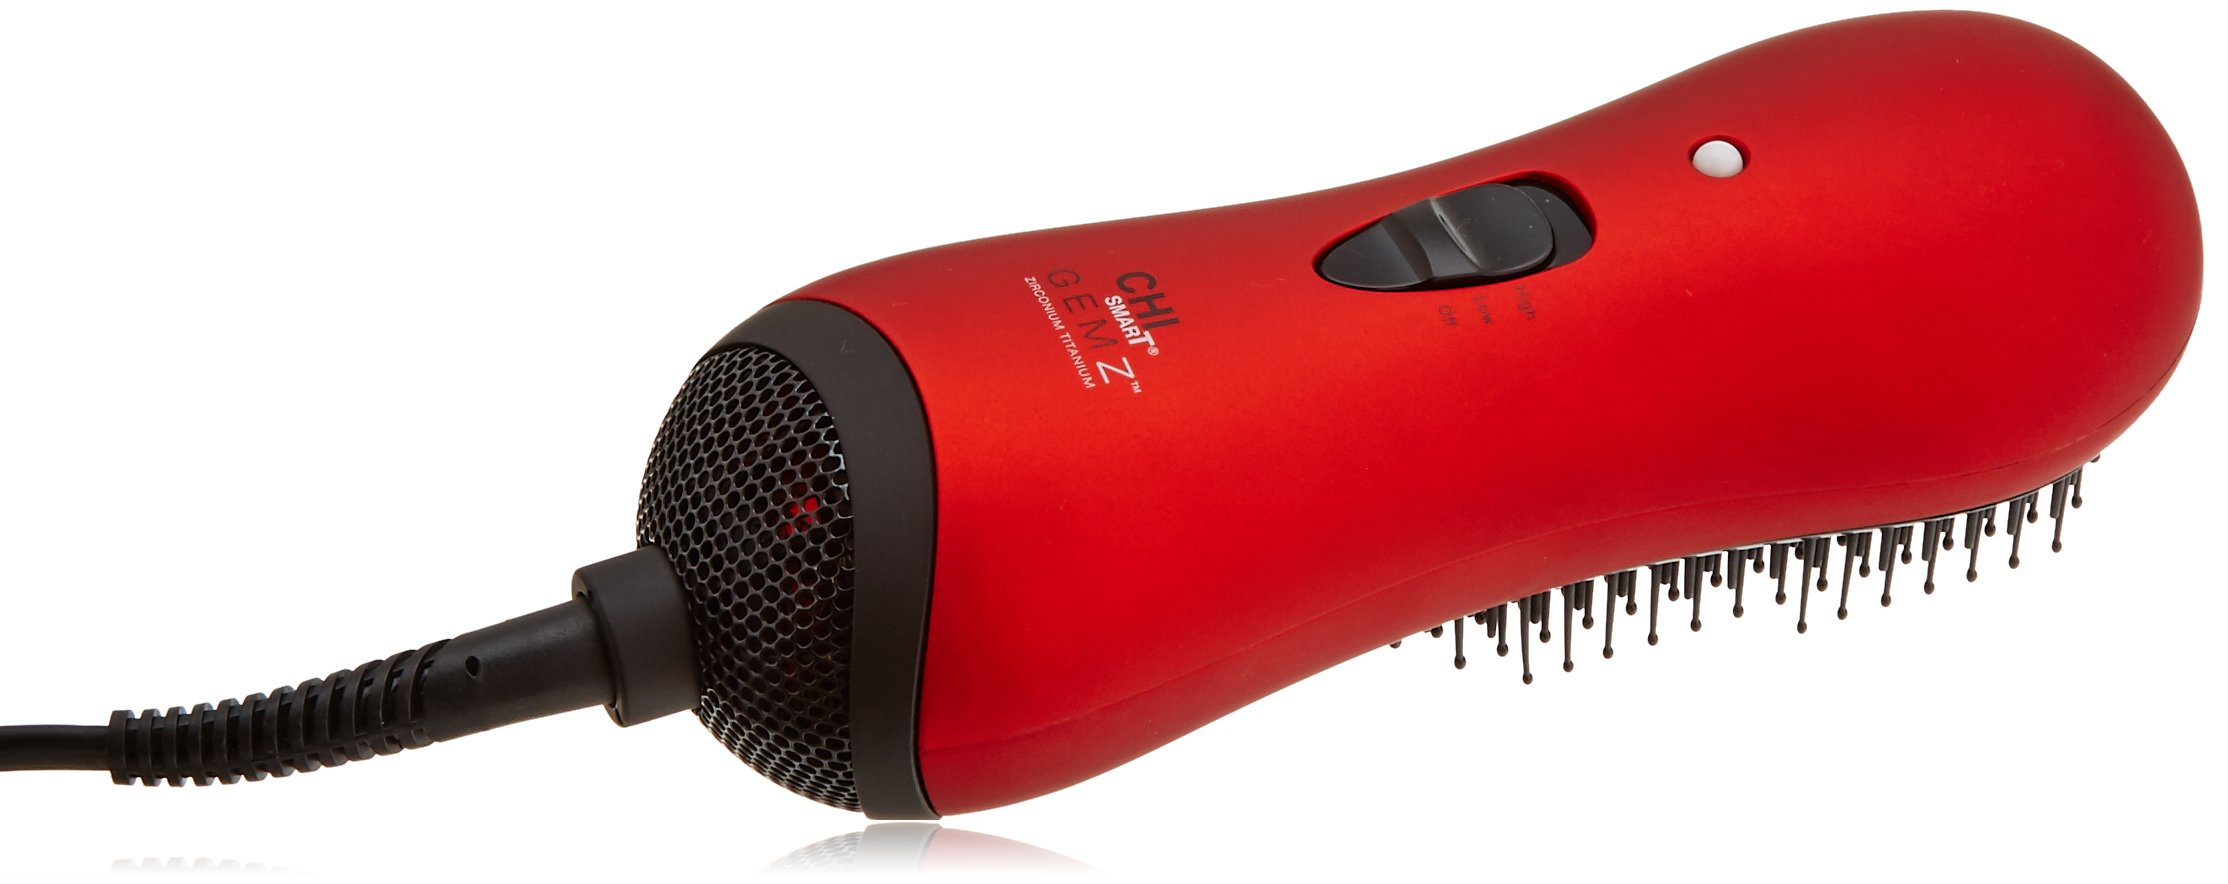 CHI Smart Gemz Hair Dryer Brush by CHI